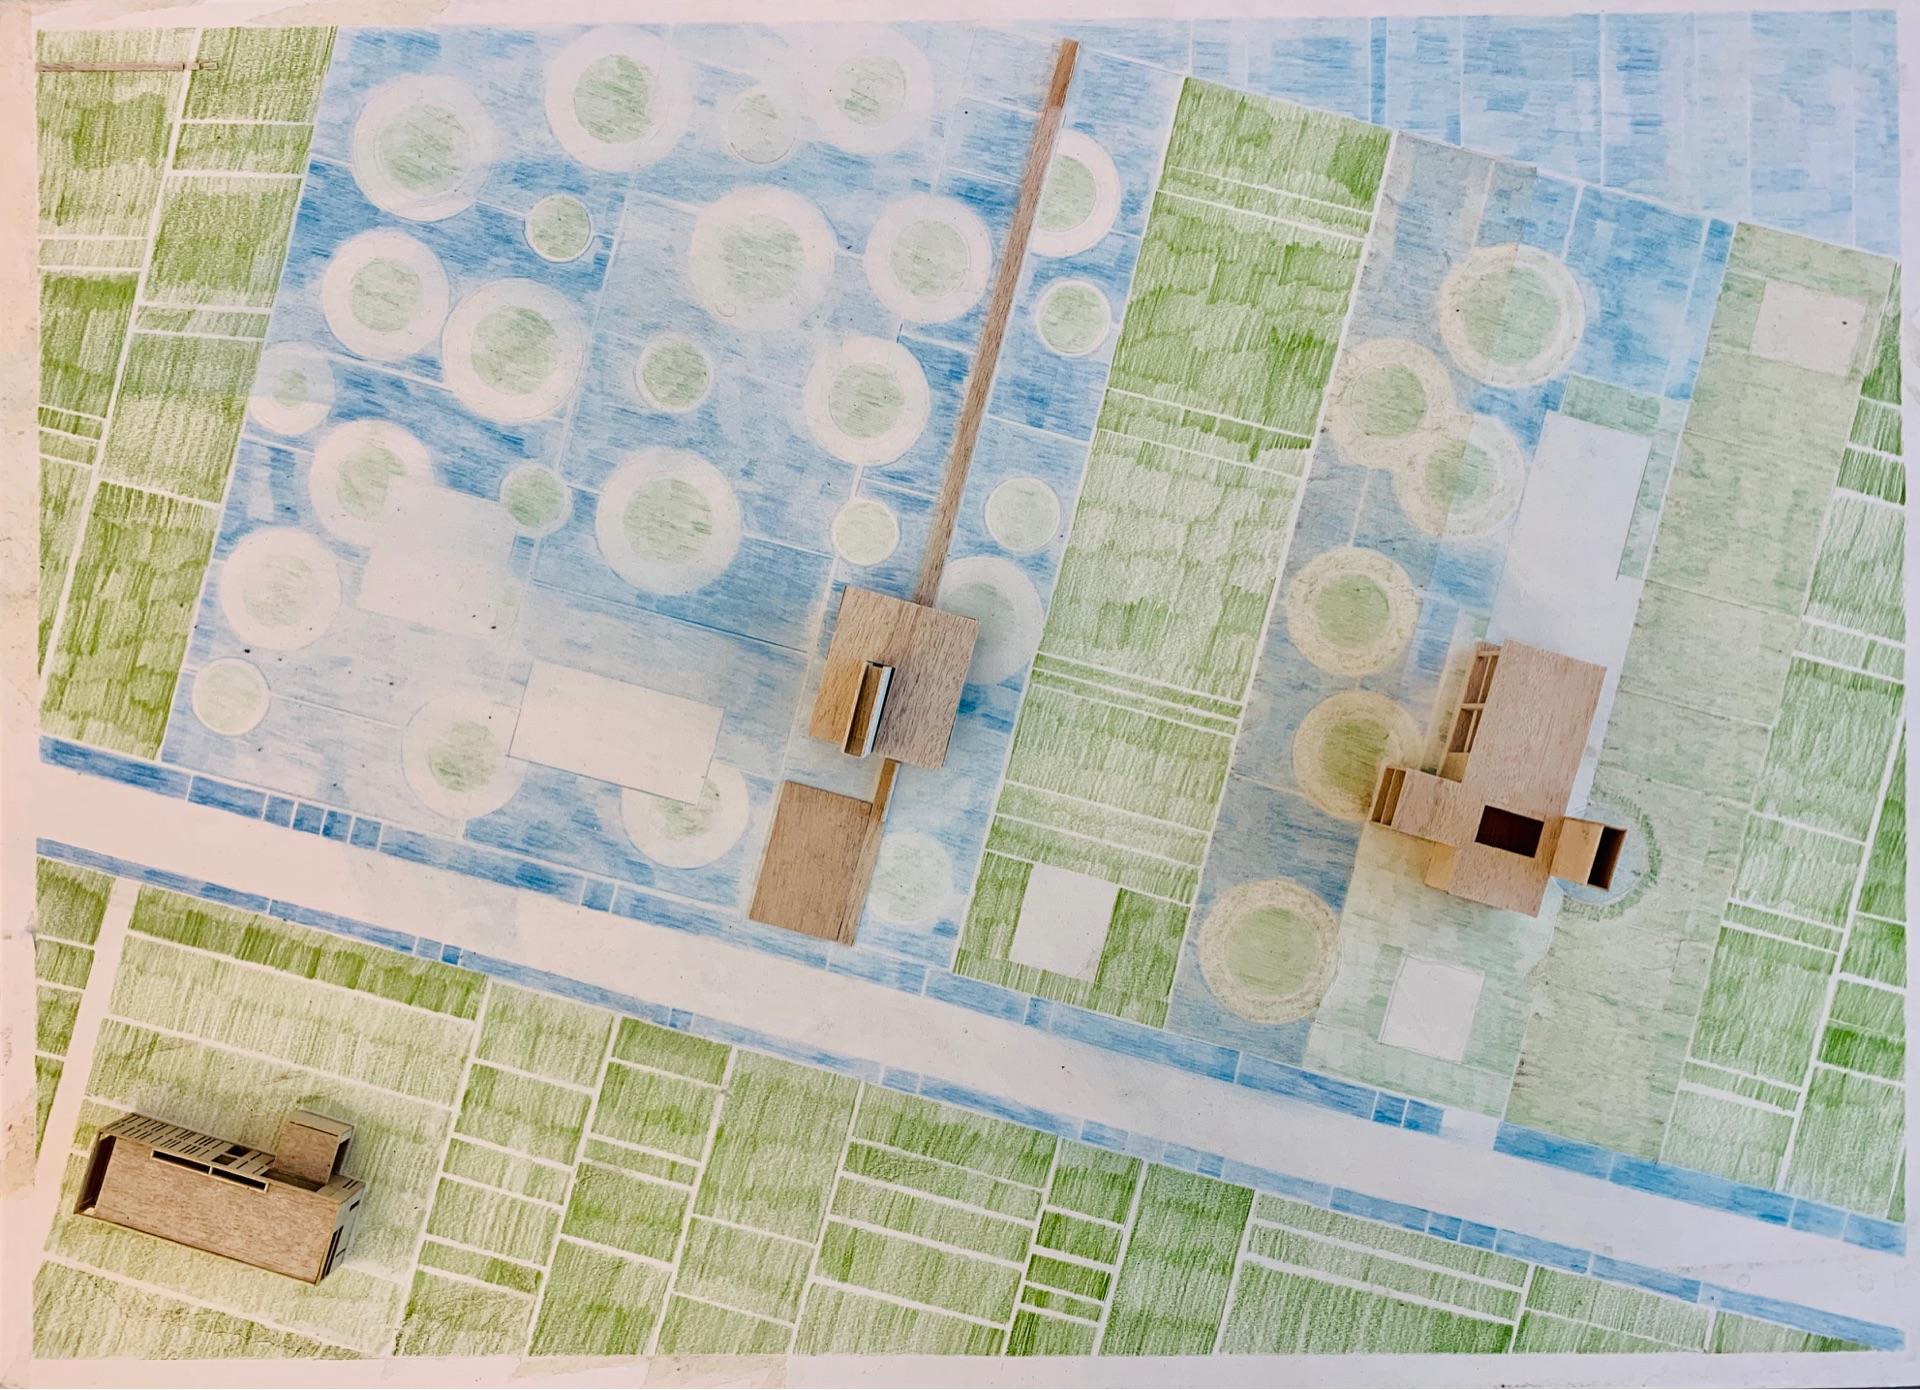 德築-DEZU-project-日光綠築-architecture-building-model-1